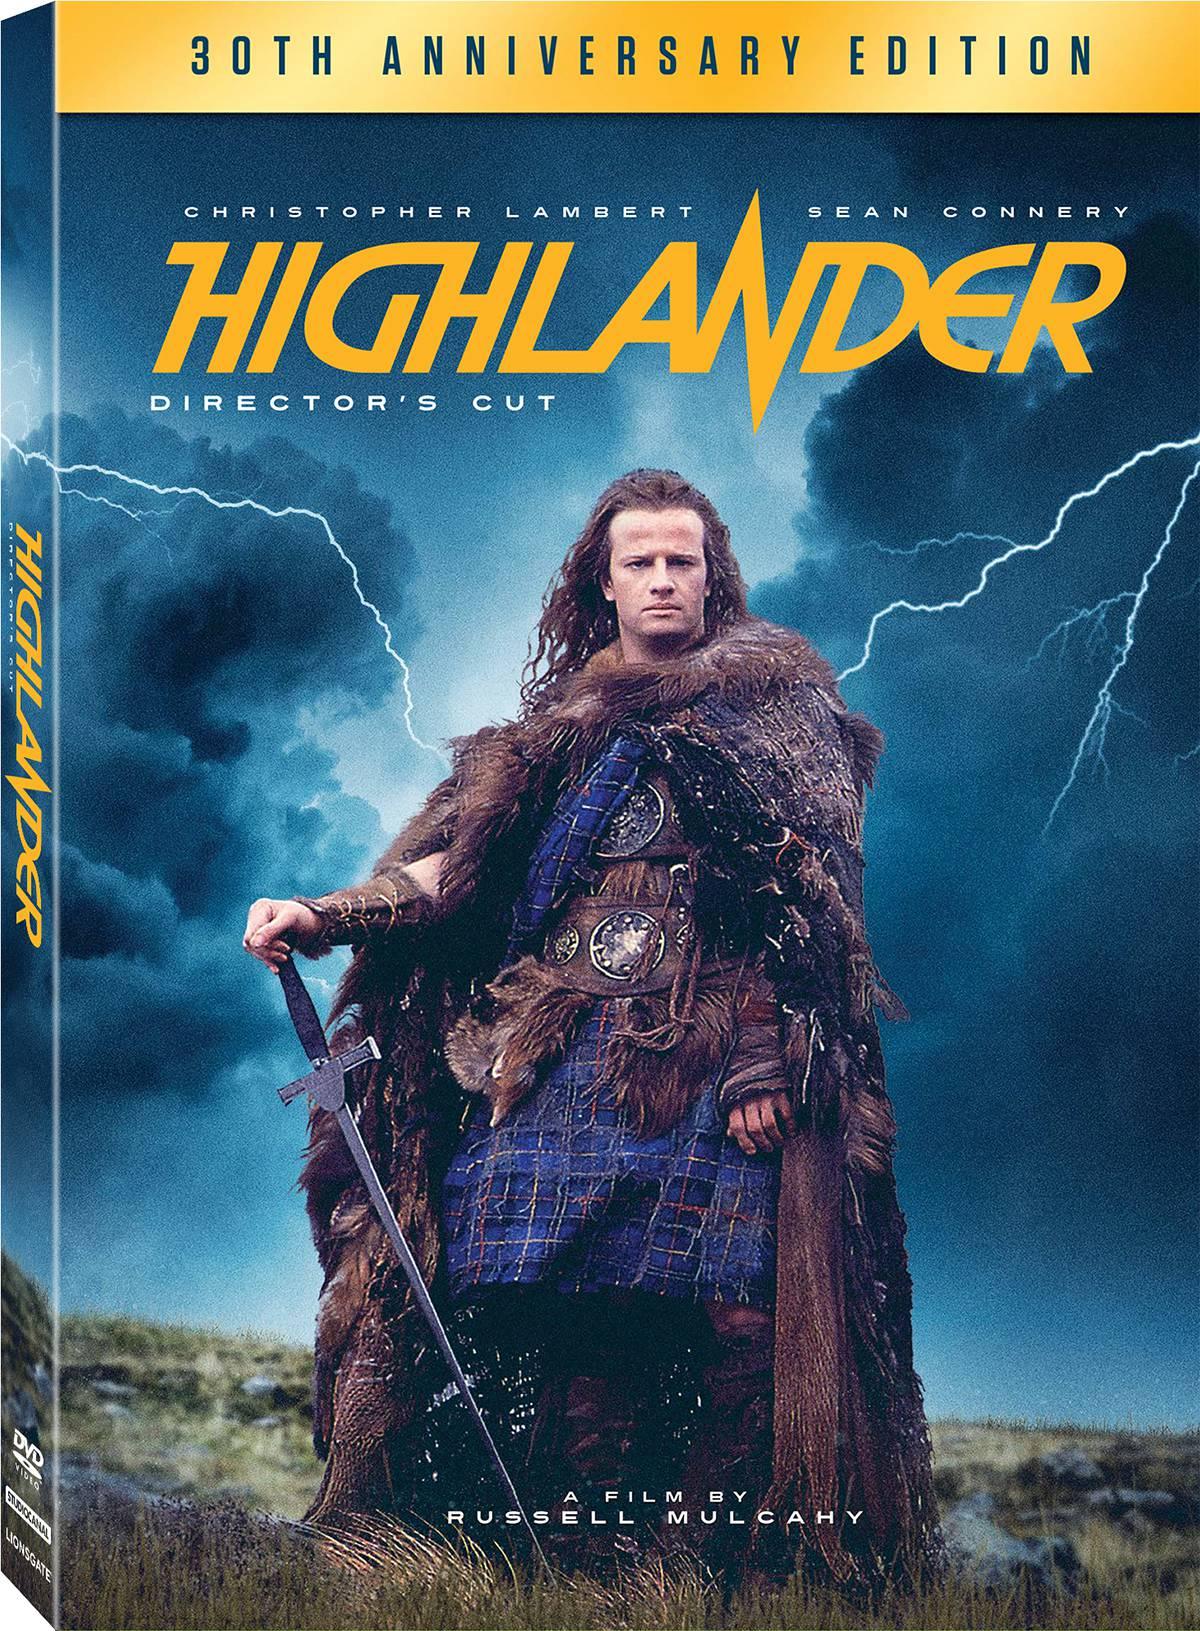 Highlander : 30th Anniversary DVD Review, Highlander